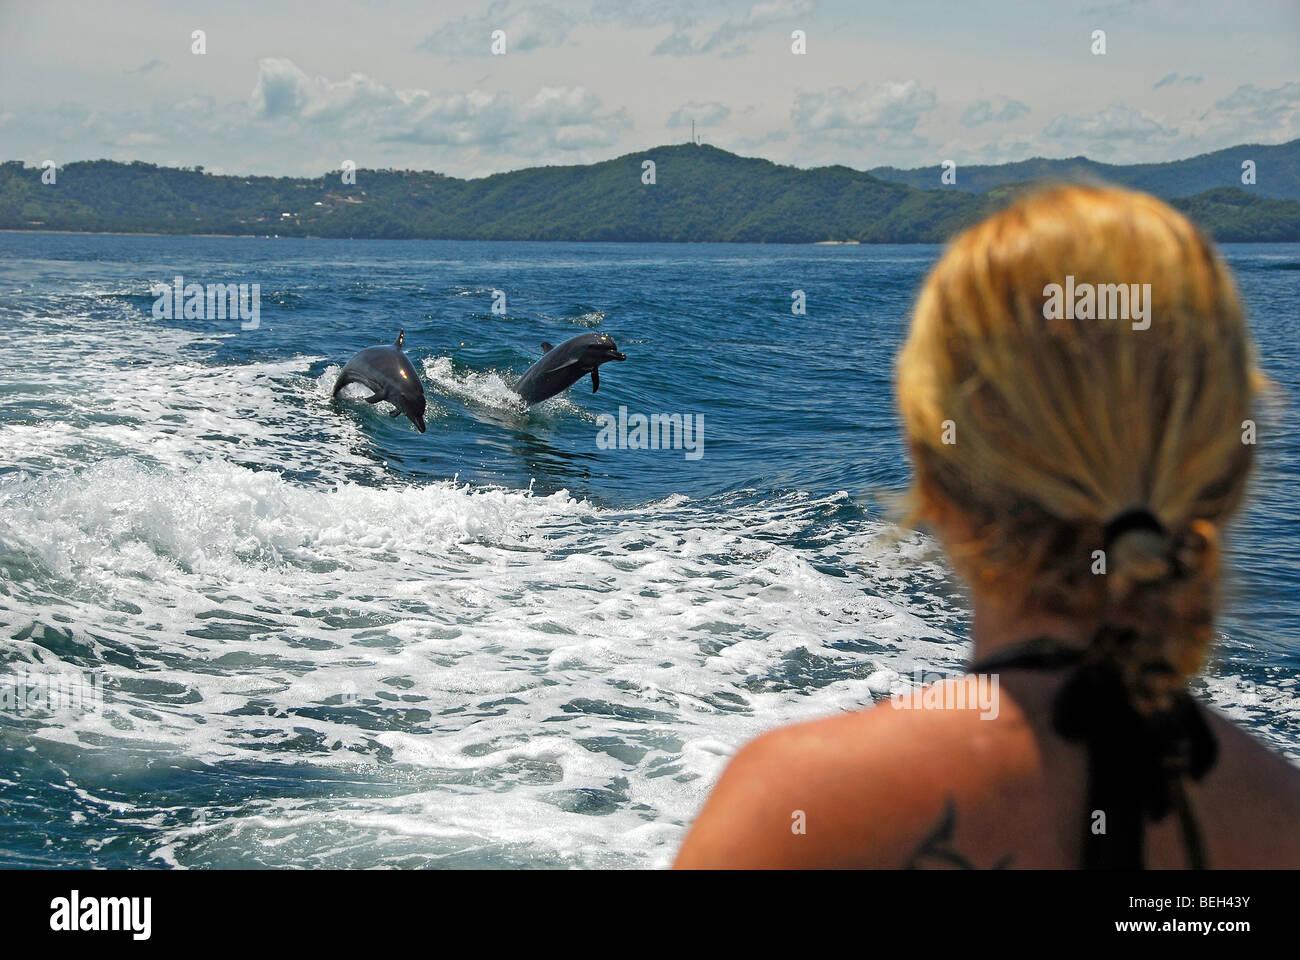 Dolphin watching, Stenella longirostris, Playas del Coco, Costa Rica - Stock Image